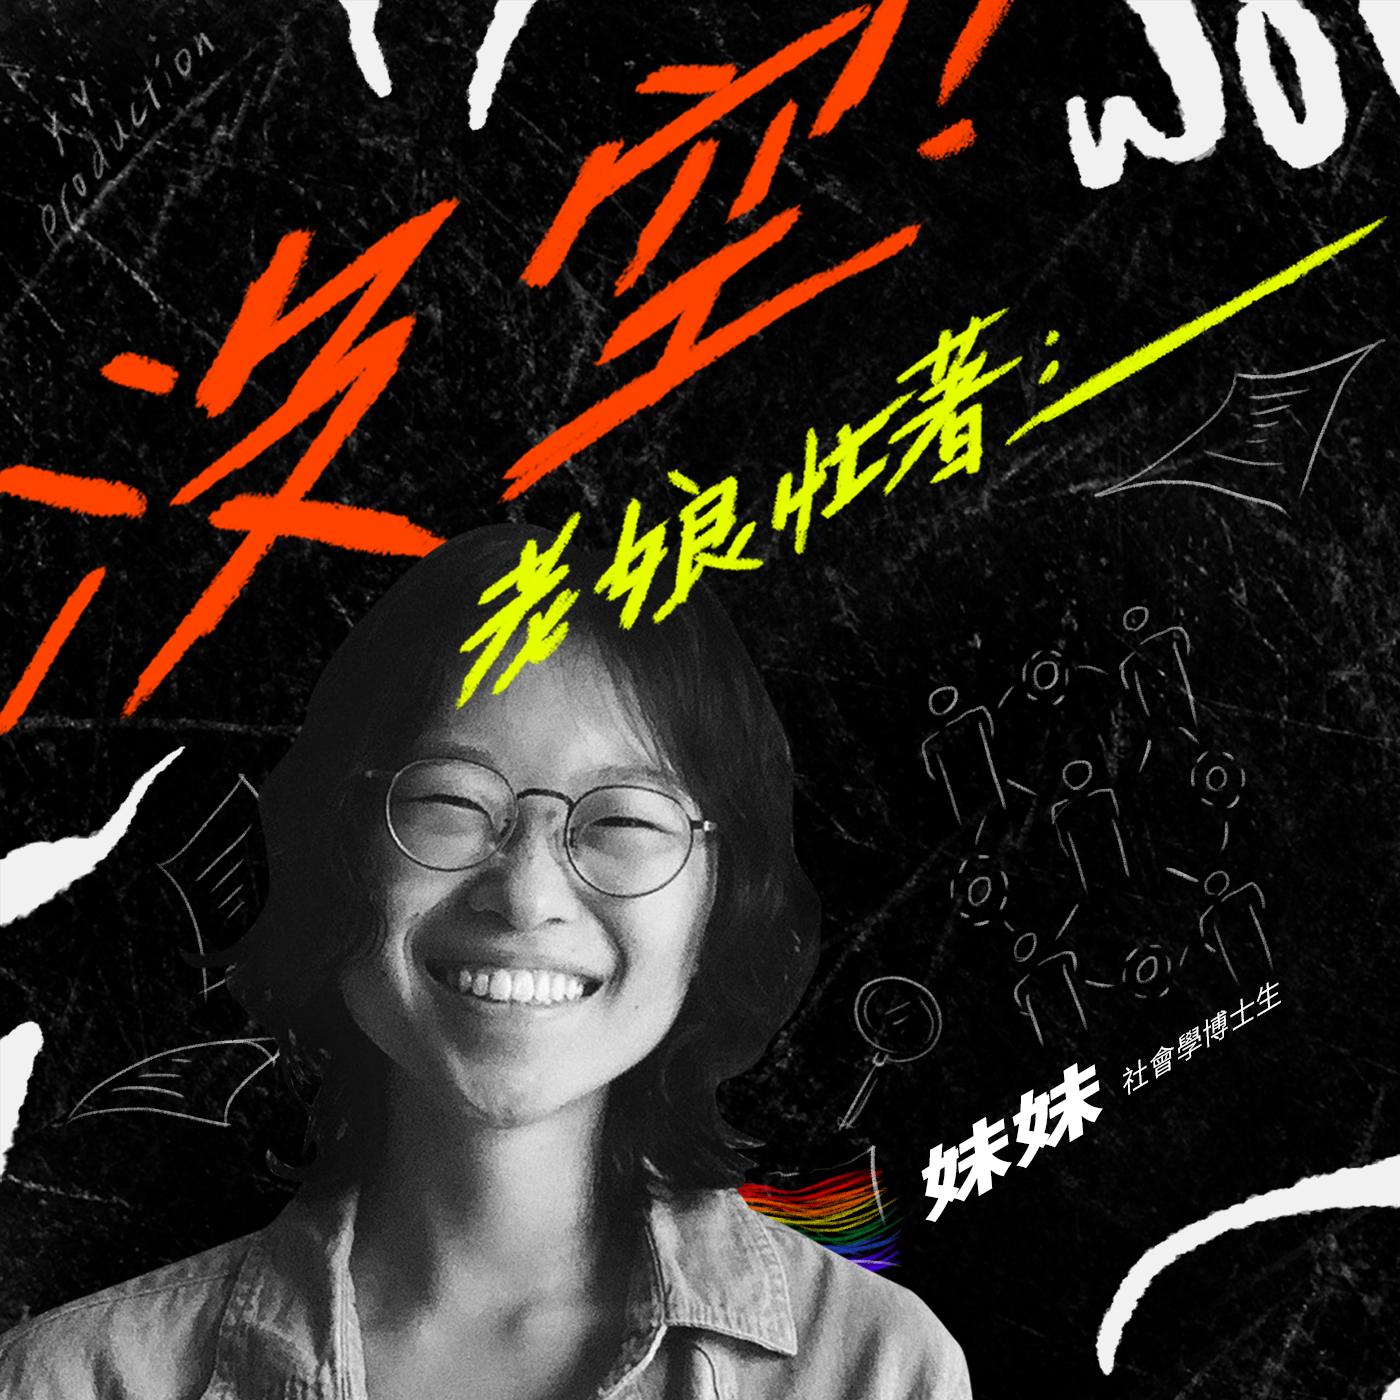 S1E6 妹妹/社會學博士生(下) - 是同志也是研究者,探索個人煩惱更看見社會脈動